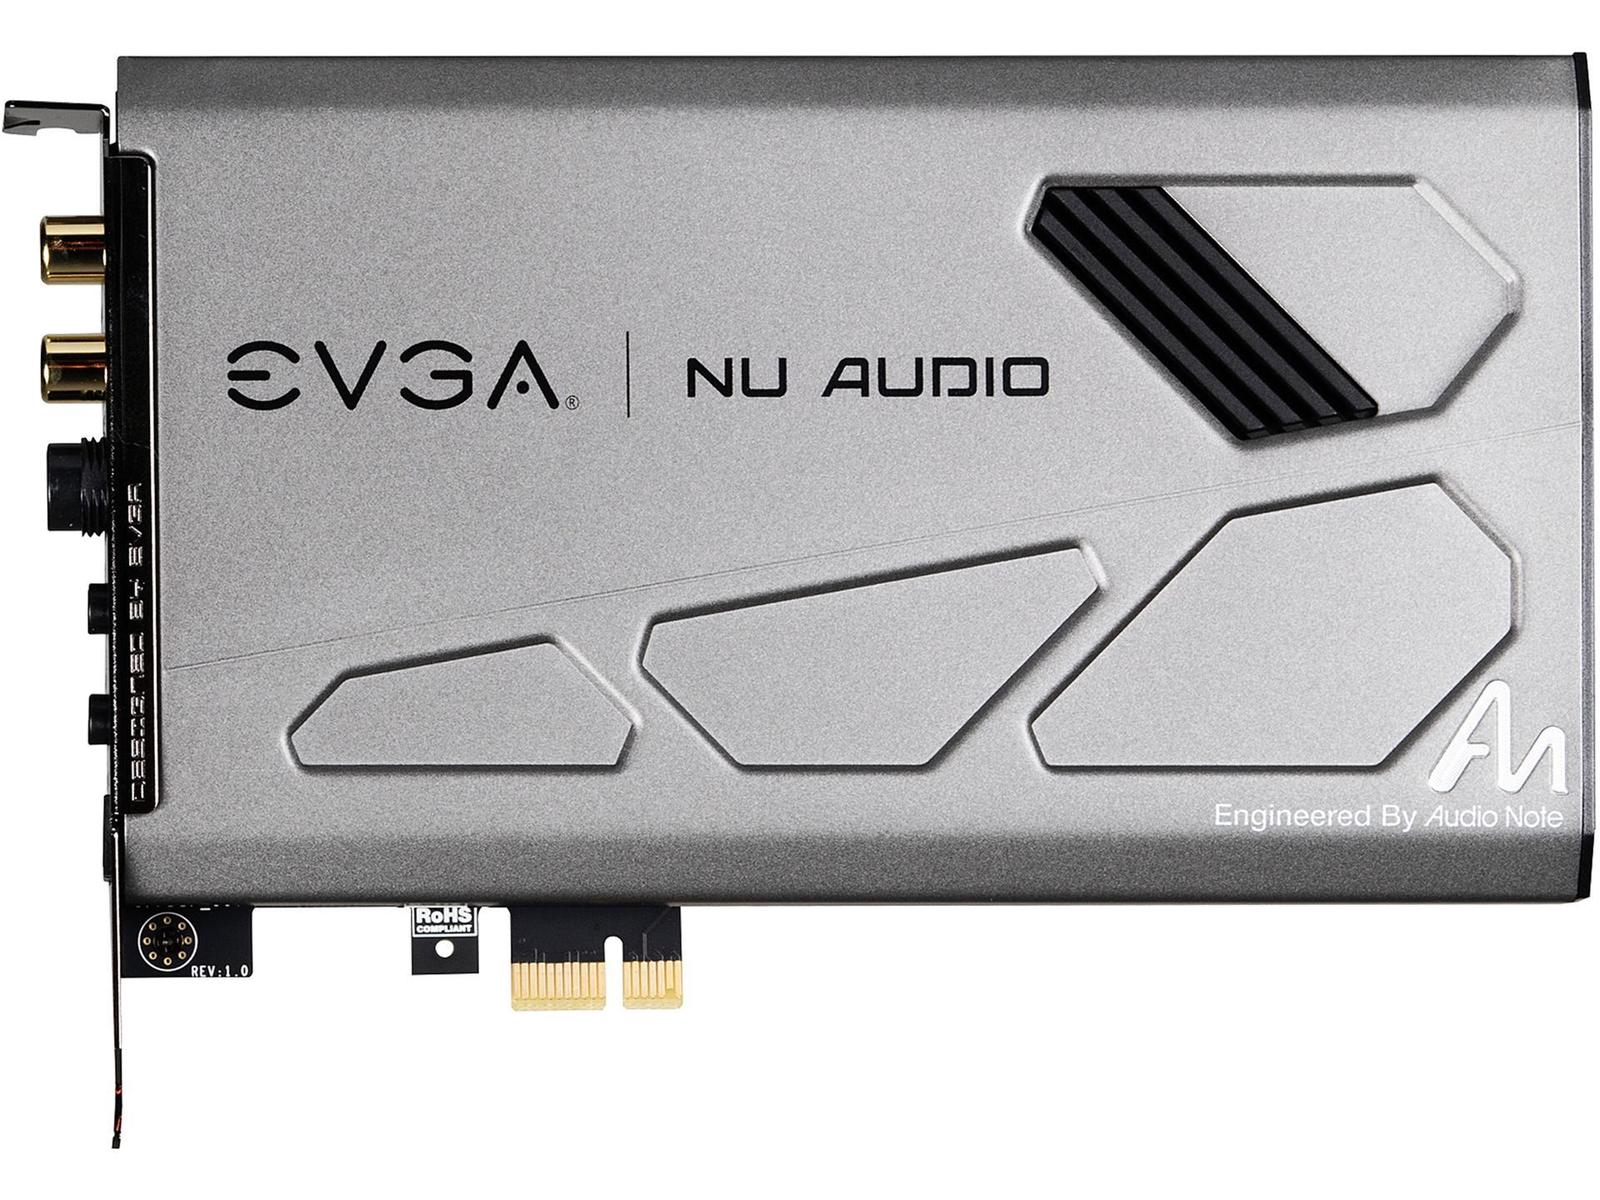 EVGA NU 24-bit 192 kHz Sound Card